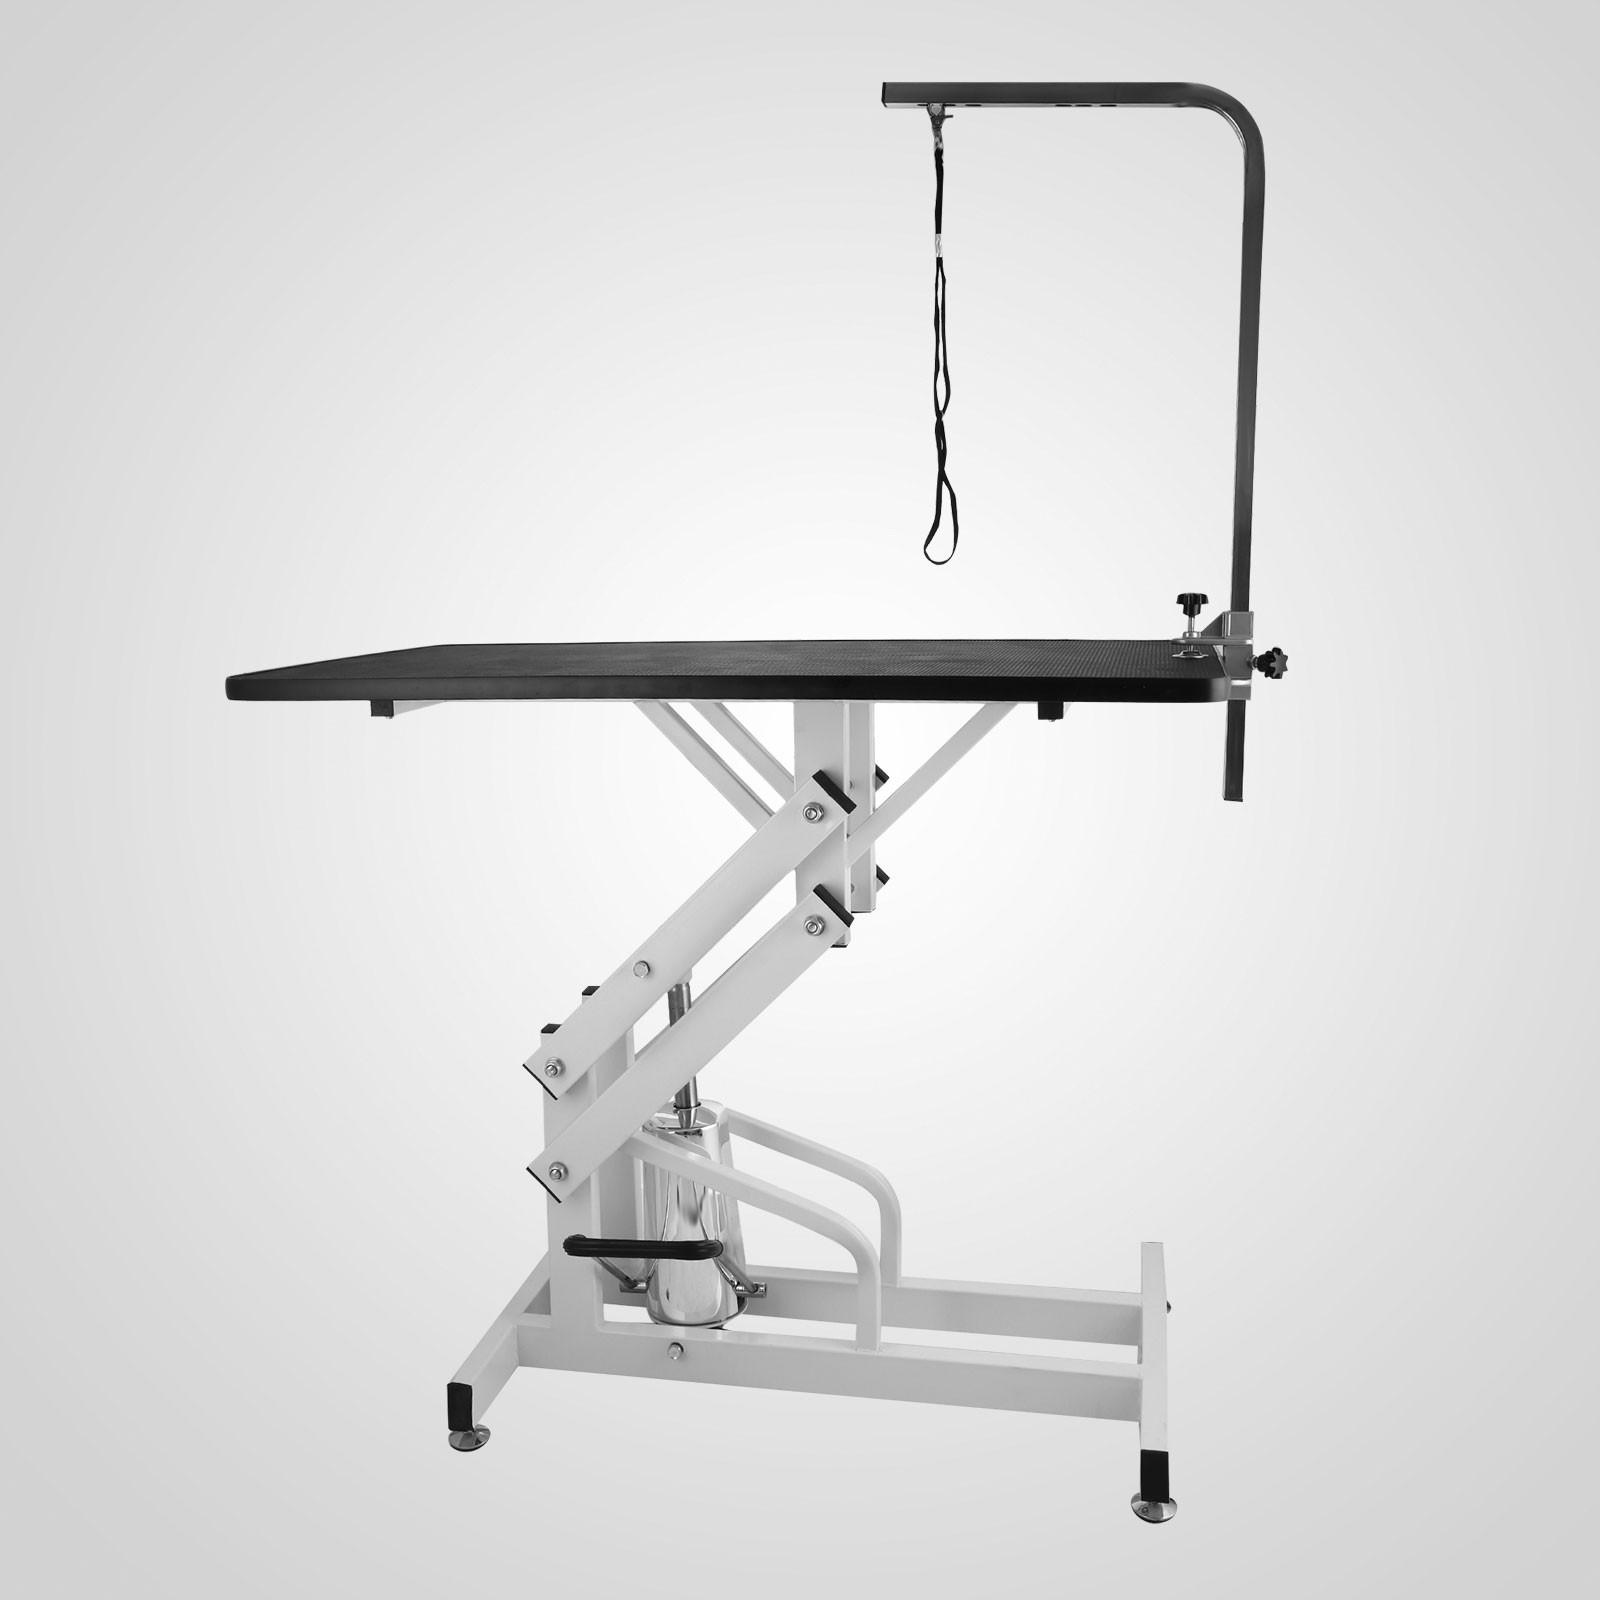 Wood Hydraulic Arm : Z lift hydraulic dog cat pet grooming table detachable